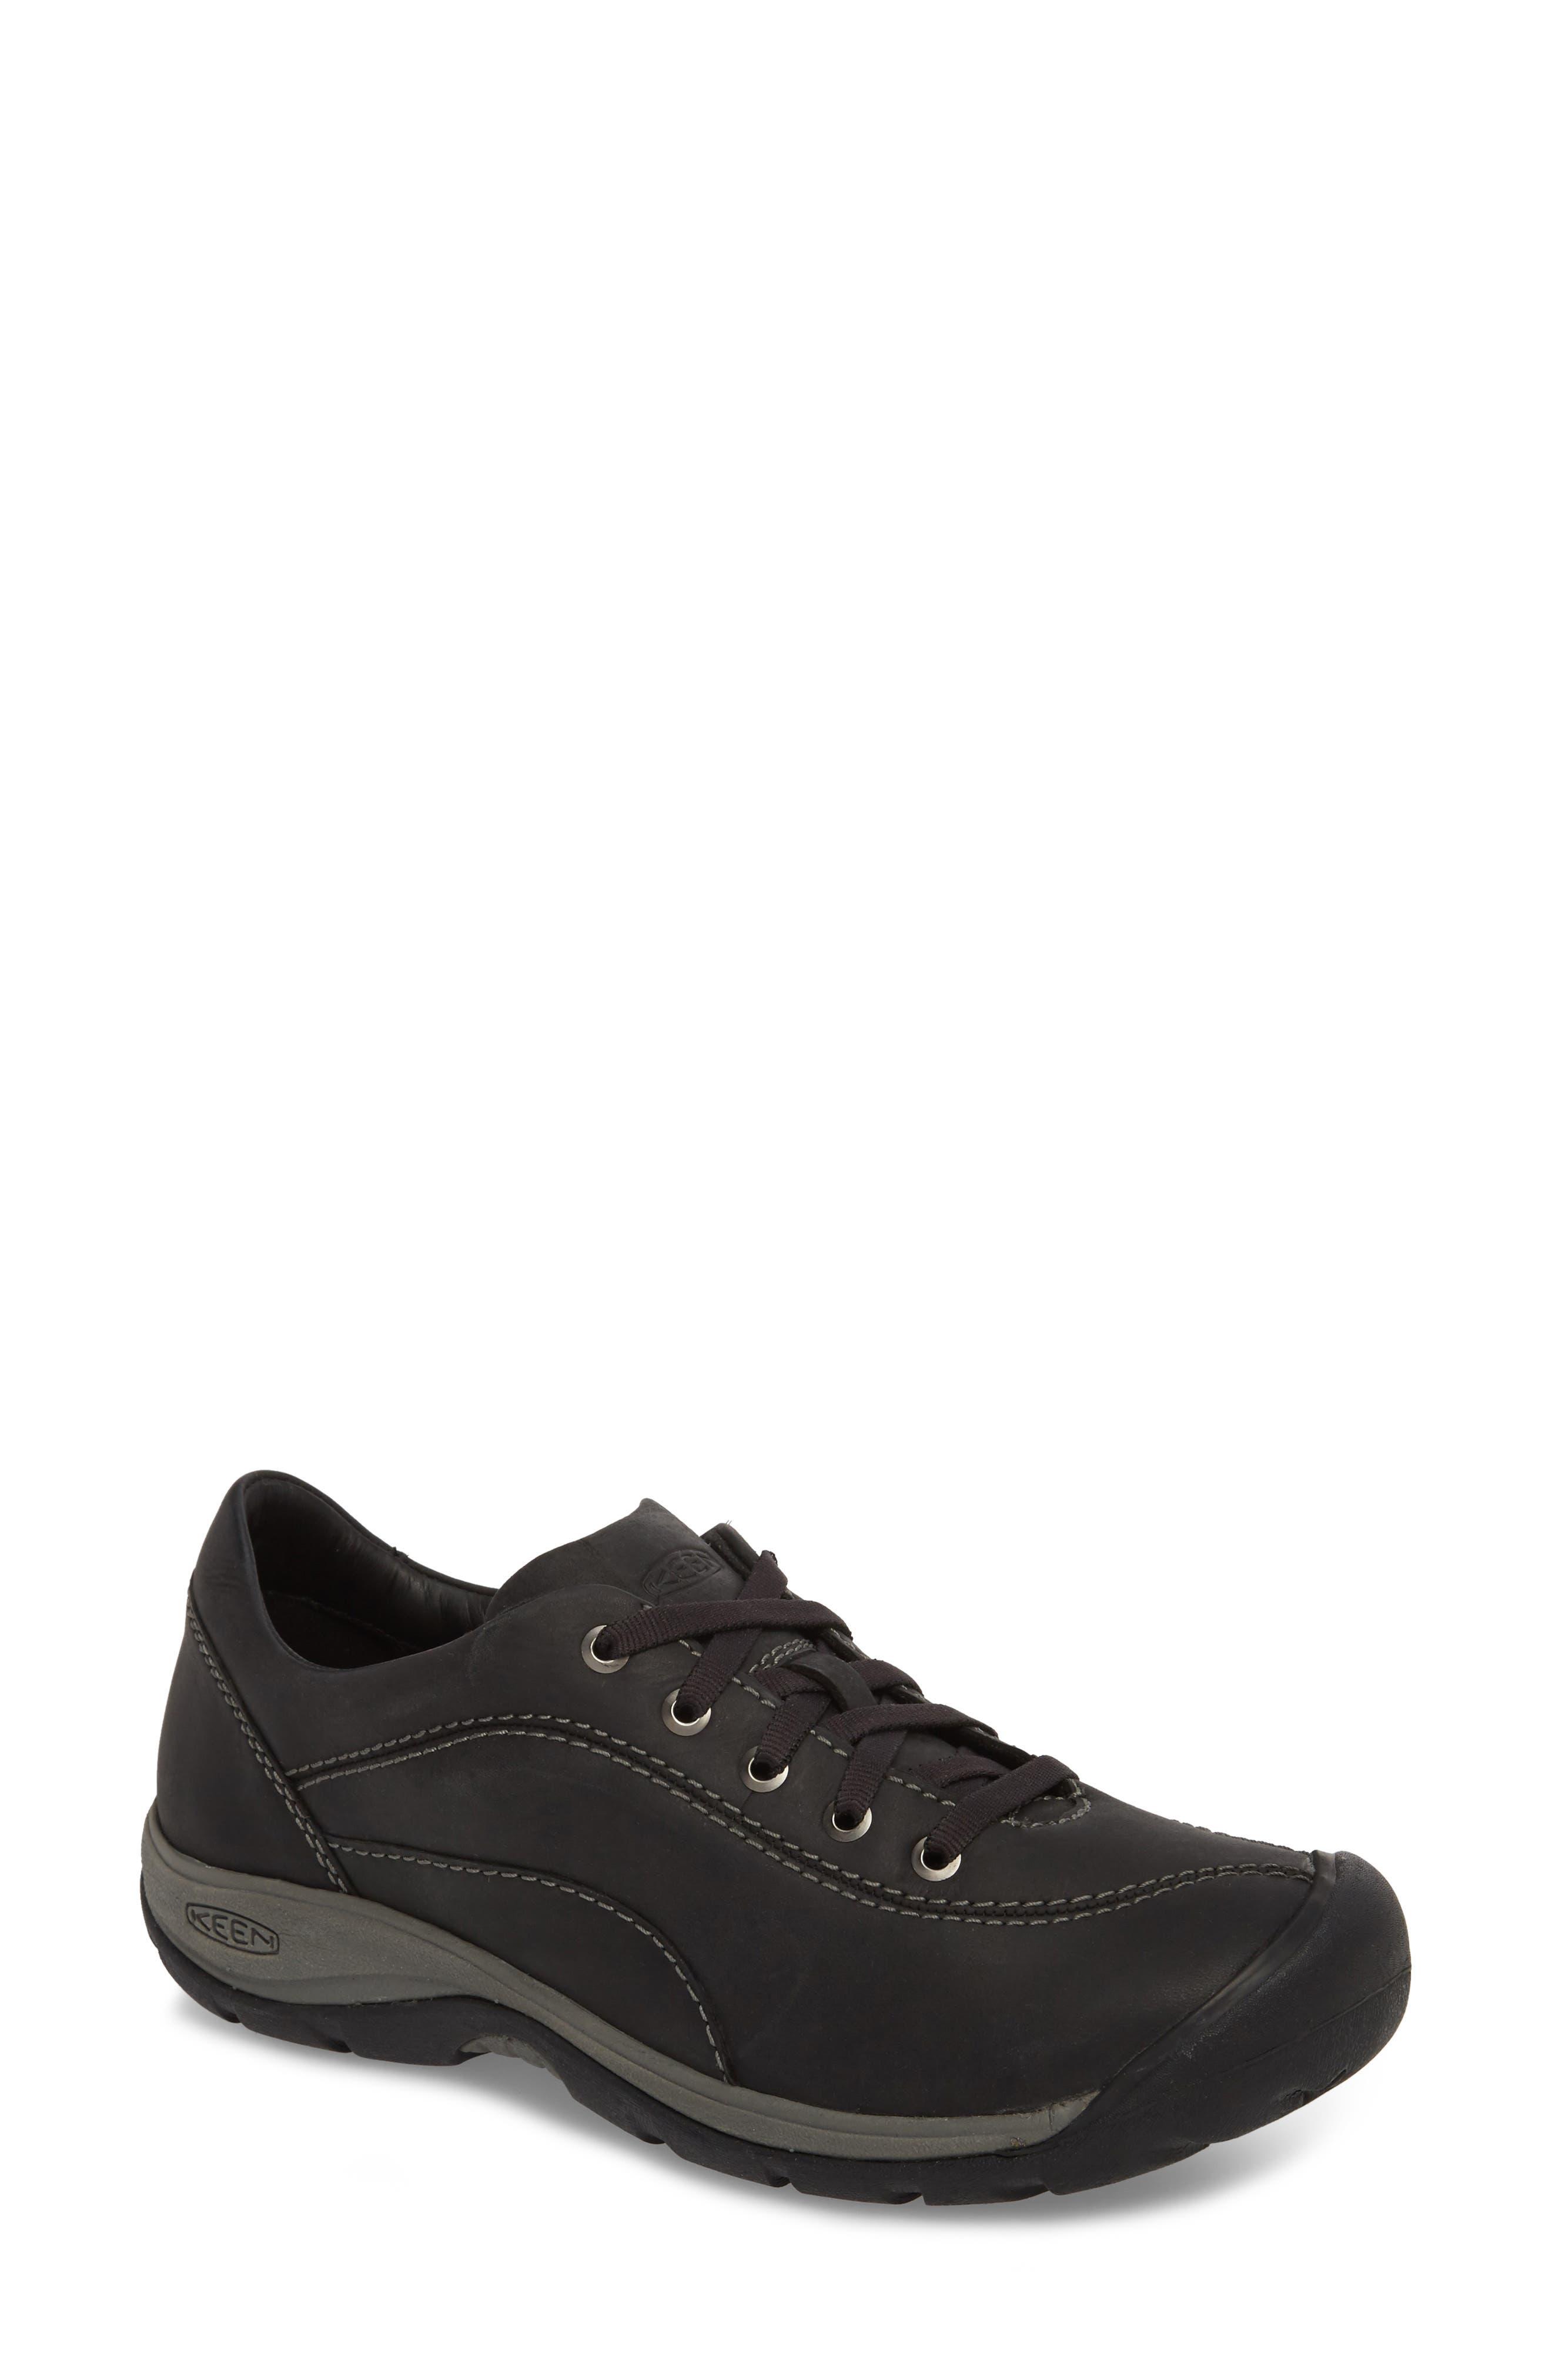 Presidio II Sneaker,                         Main,                         color, Black/ Steel Grey Leather